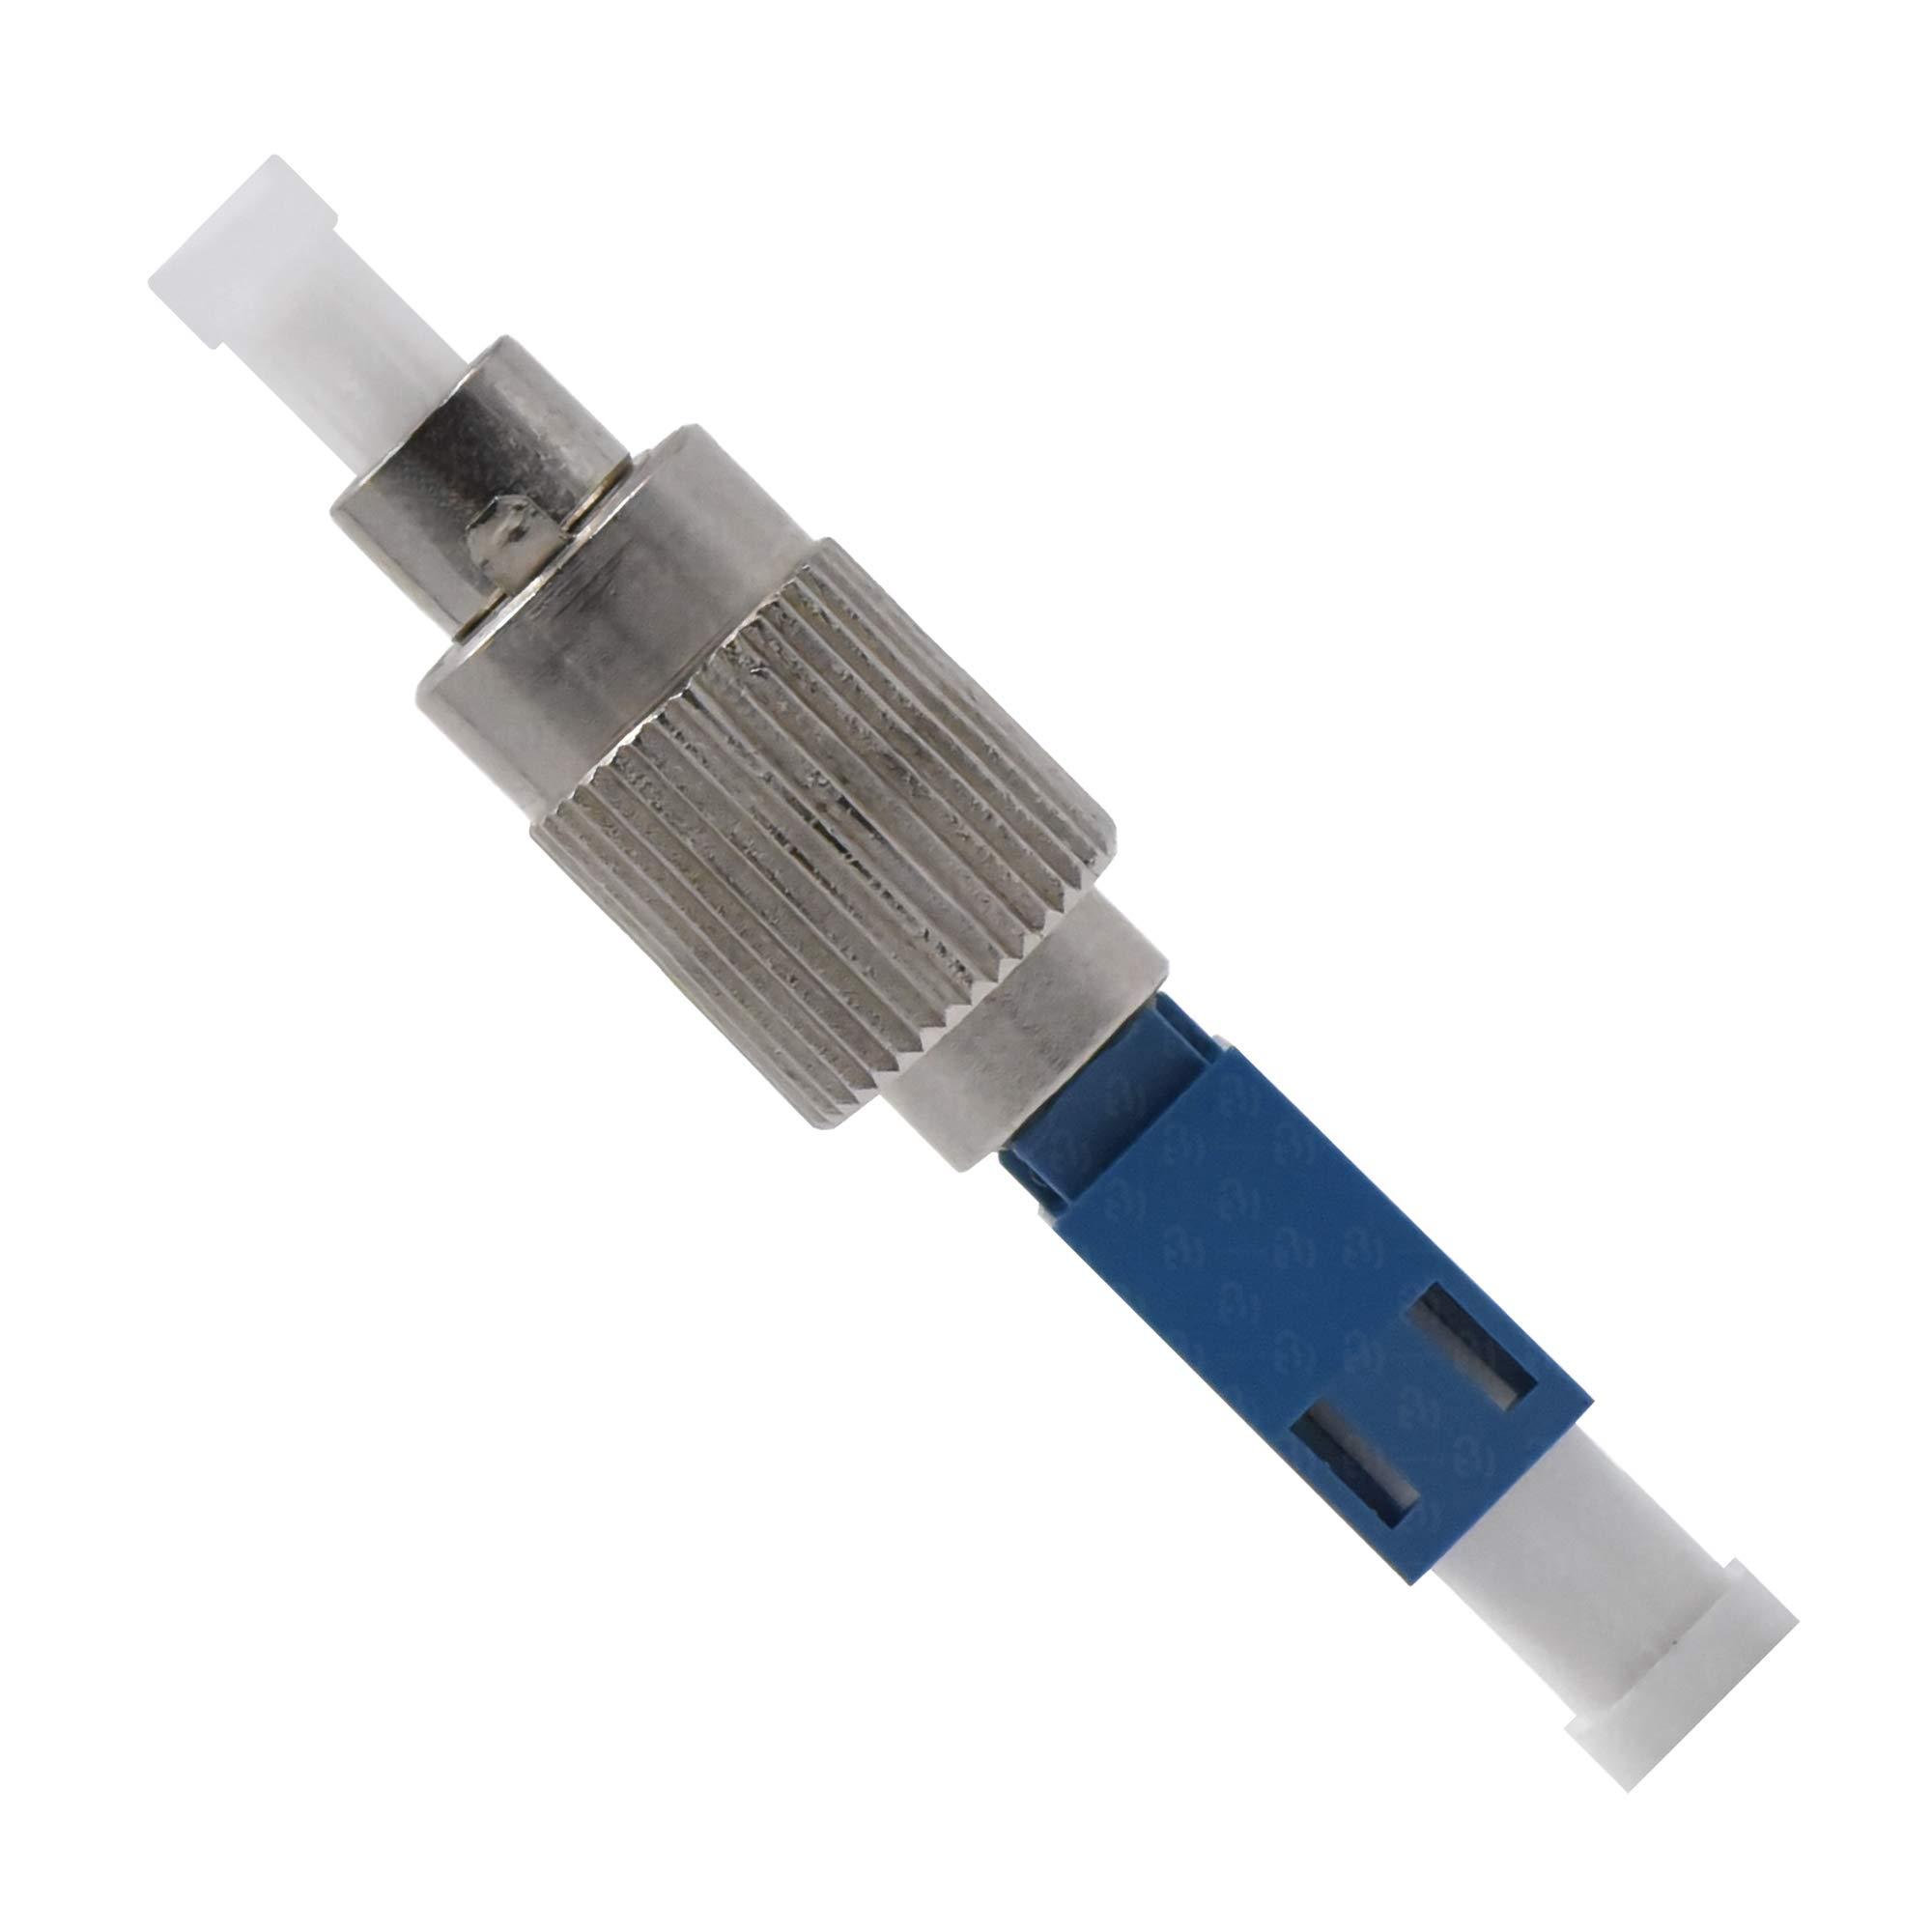 Fiber Optic LC to FC Adapter Singlemode UPC Simplex - 1 Pack - Beyondtech Visual Fault Locator (VFL) LC Female Coupler by BEYONDTECH